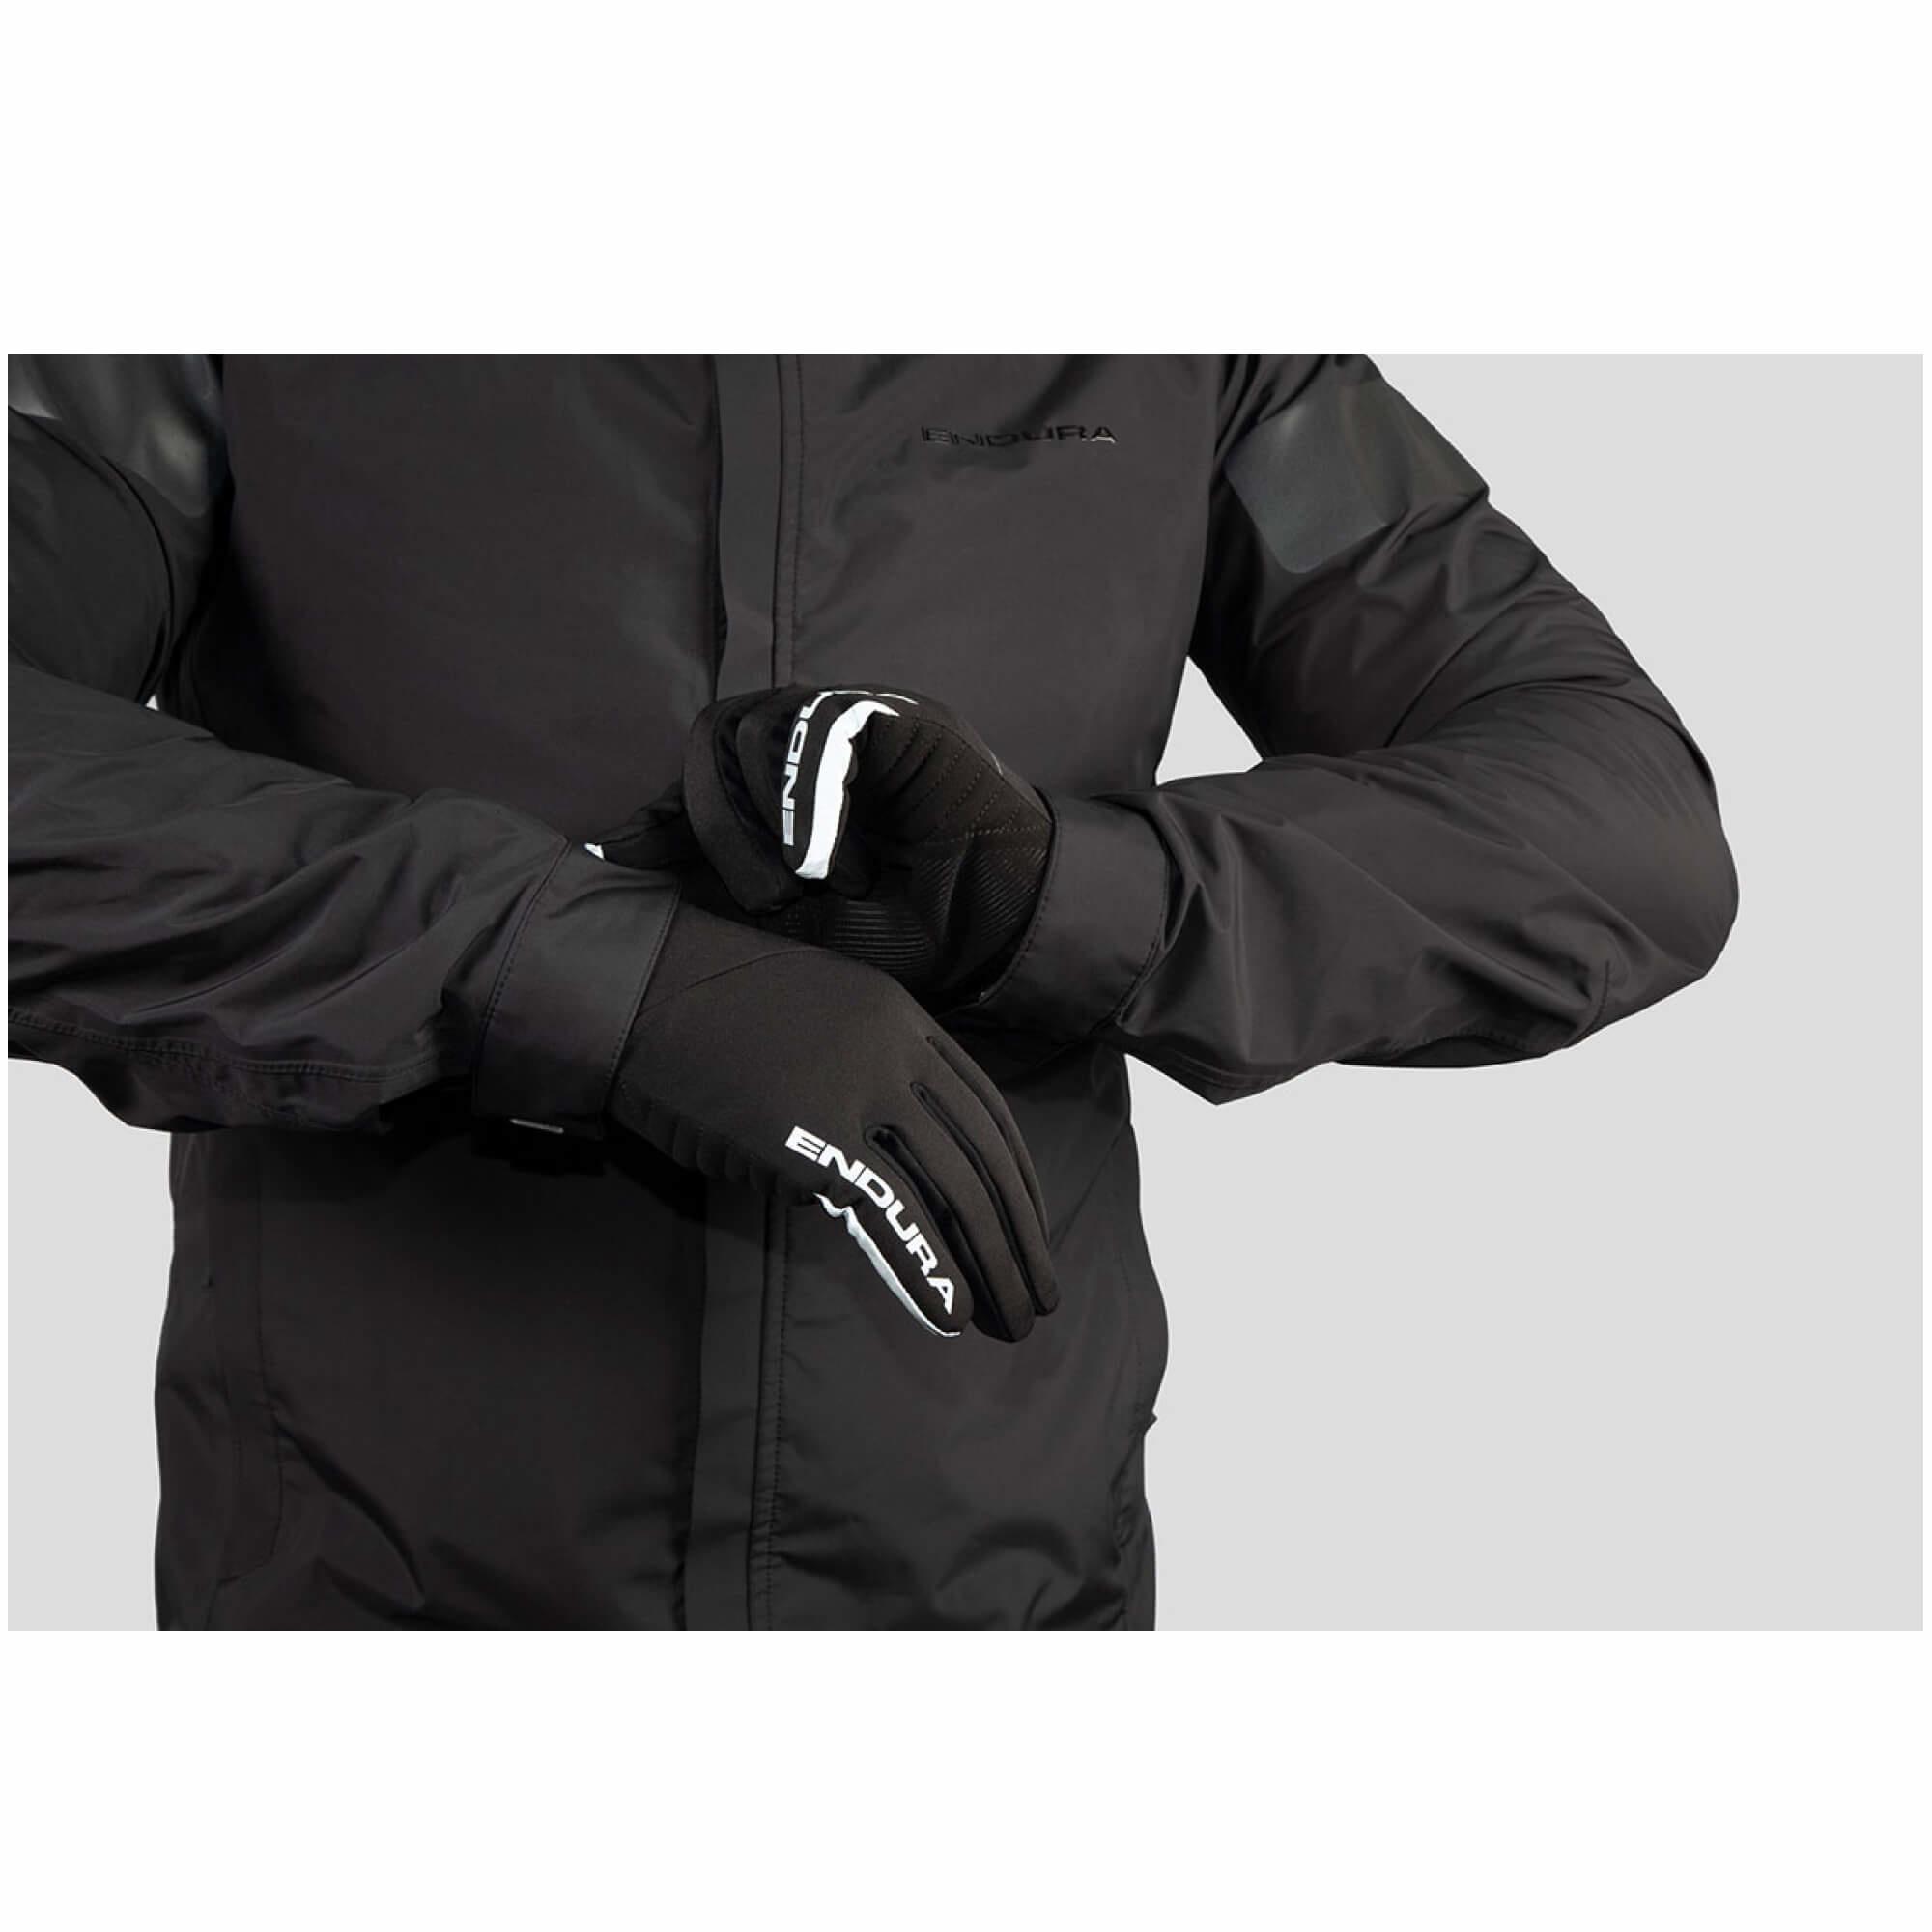 Deluge Glove-4